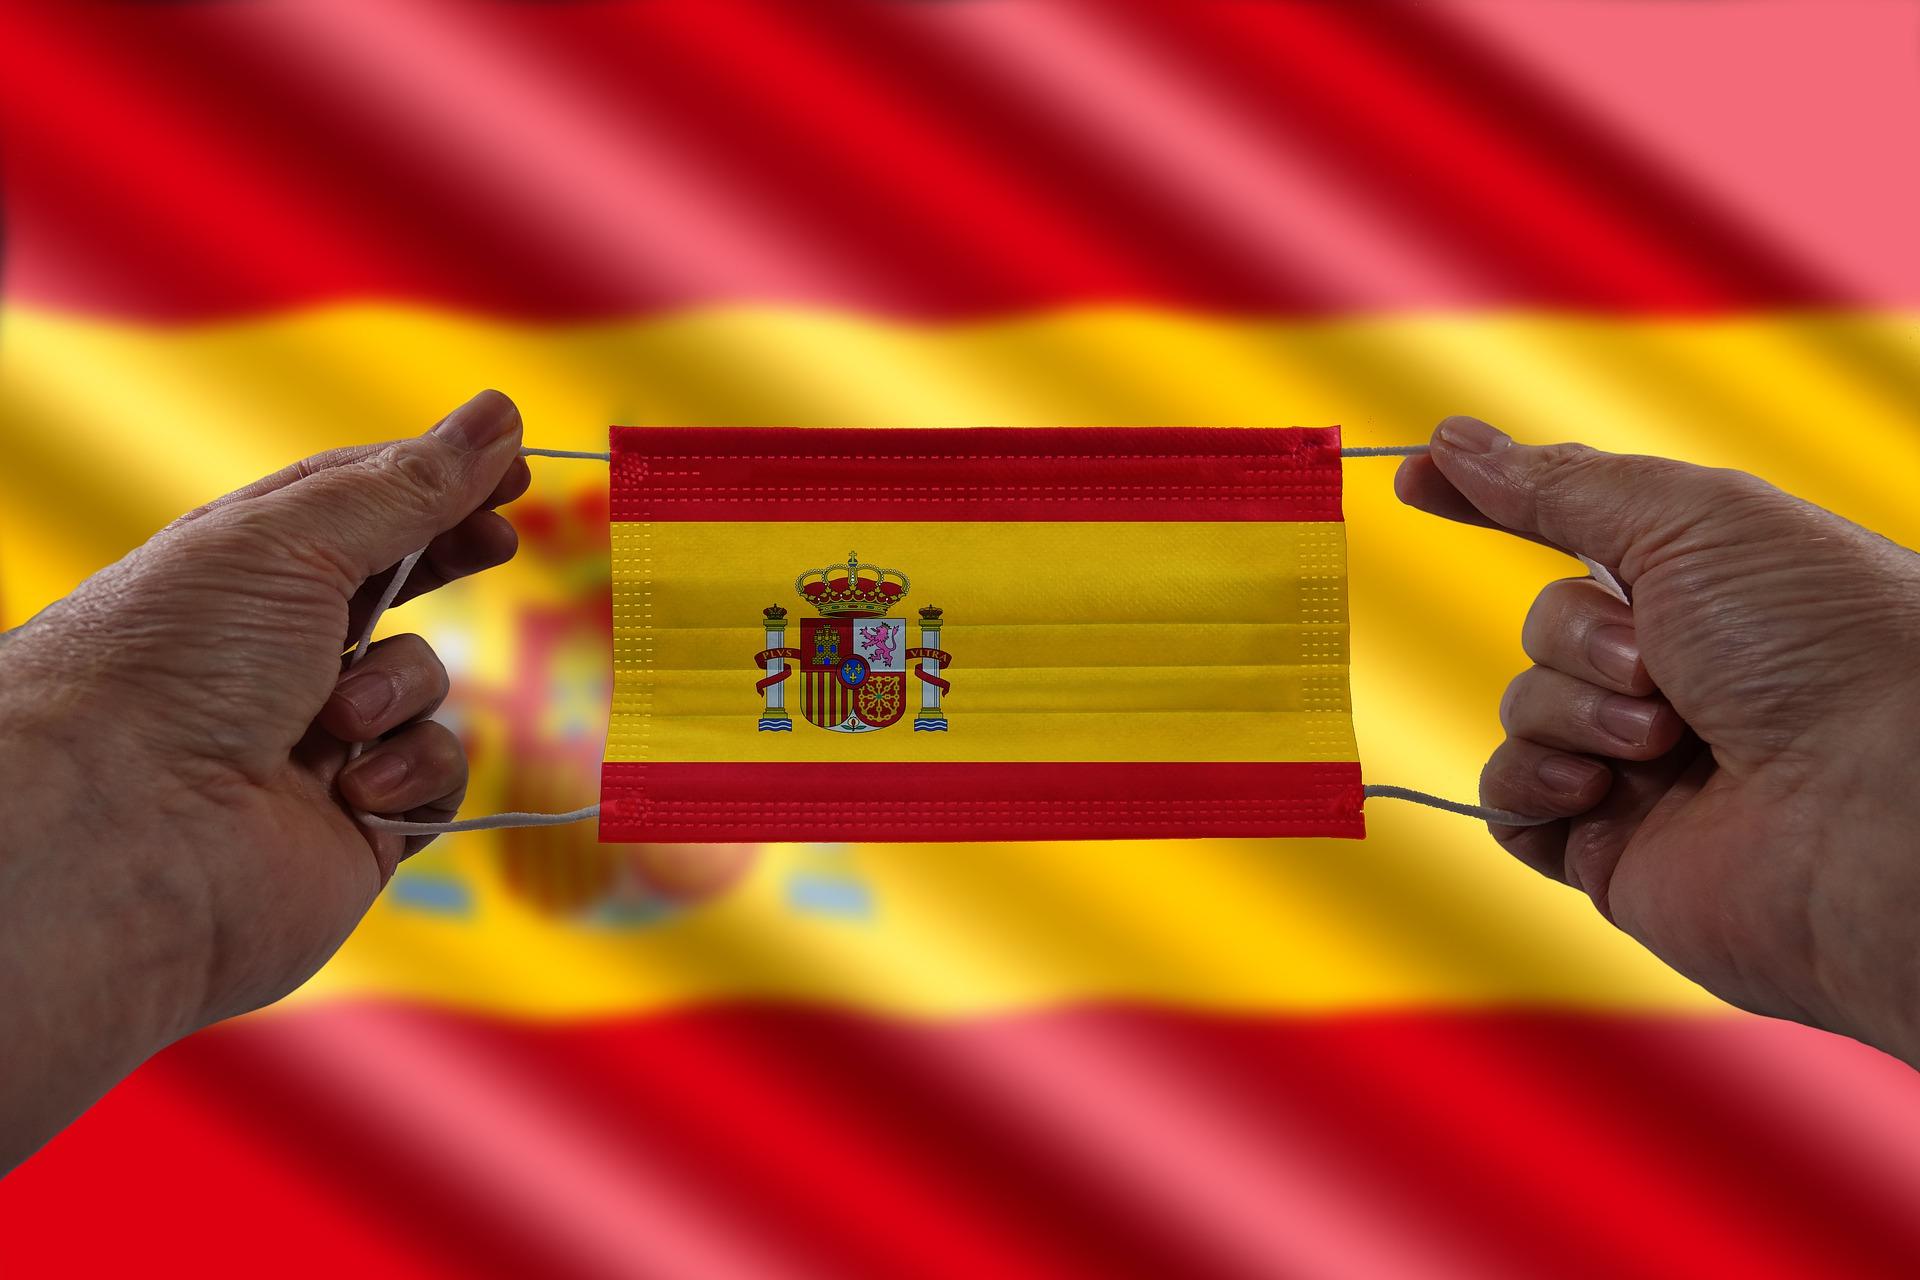 Spain Becomes the Epicenter of Coronavirus Pandemic Again, Govt. Silent